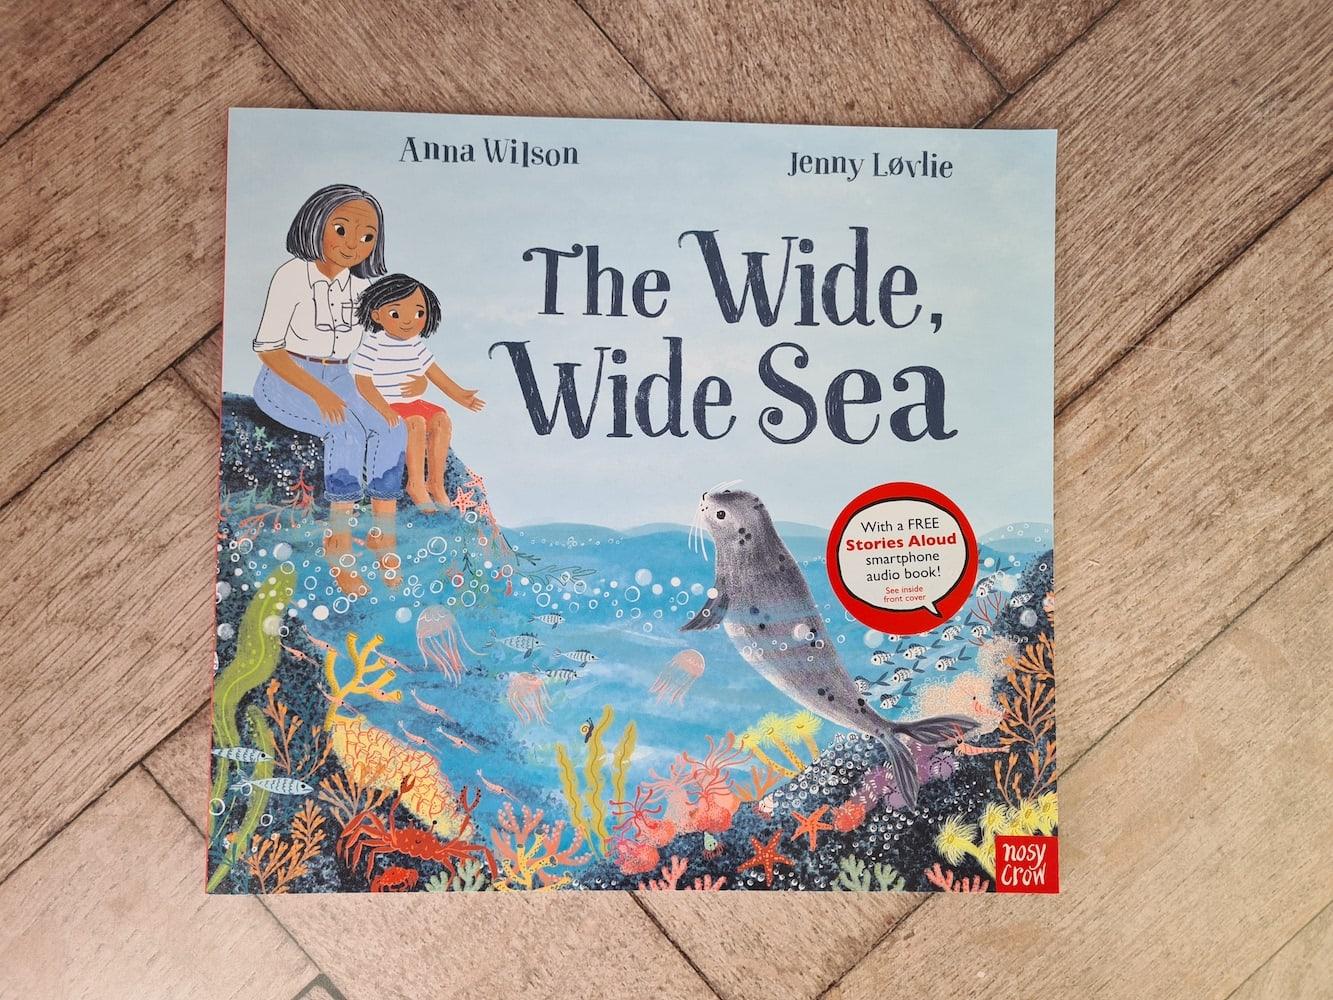 The wide wide sea